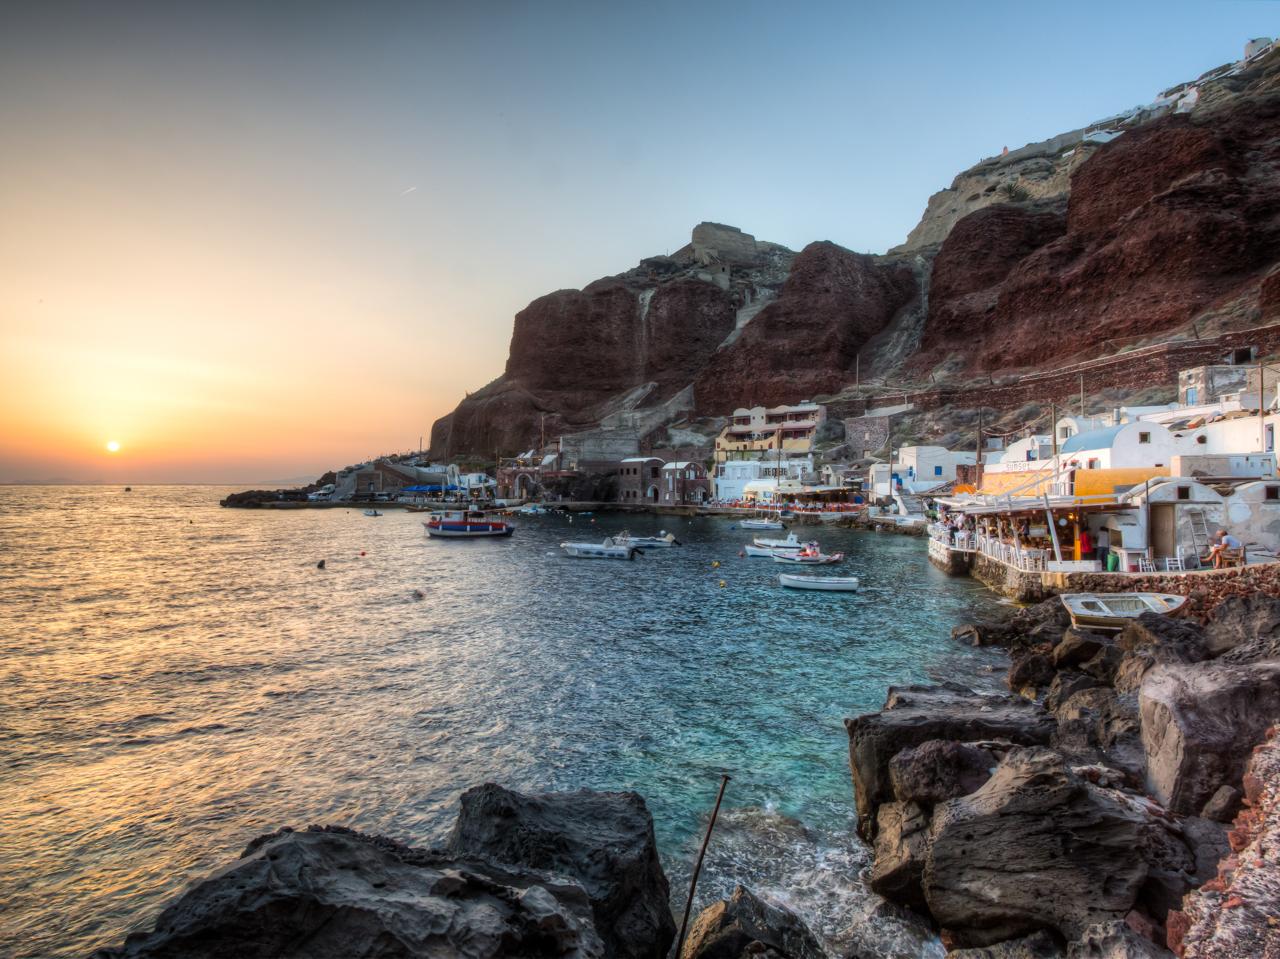 One Day Tour to Santorini from Rethymnon With Paros Jet, visit santorini from crete, best tour to santorini from rethimno tour, ferry to santorini rethimno, ferry to santorini rethymno crete, best option to visit santorini one day